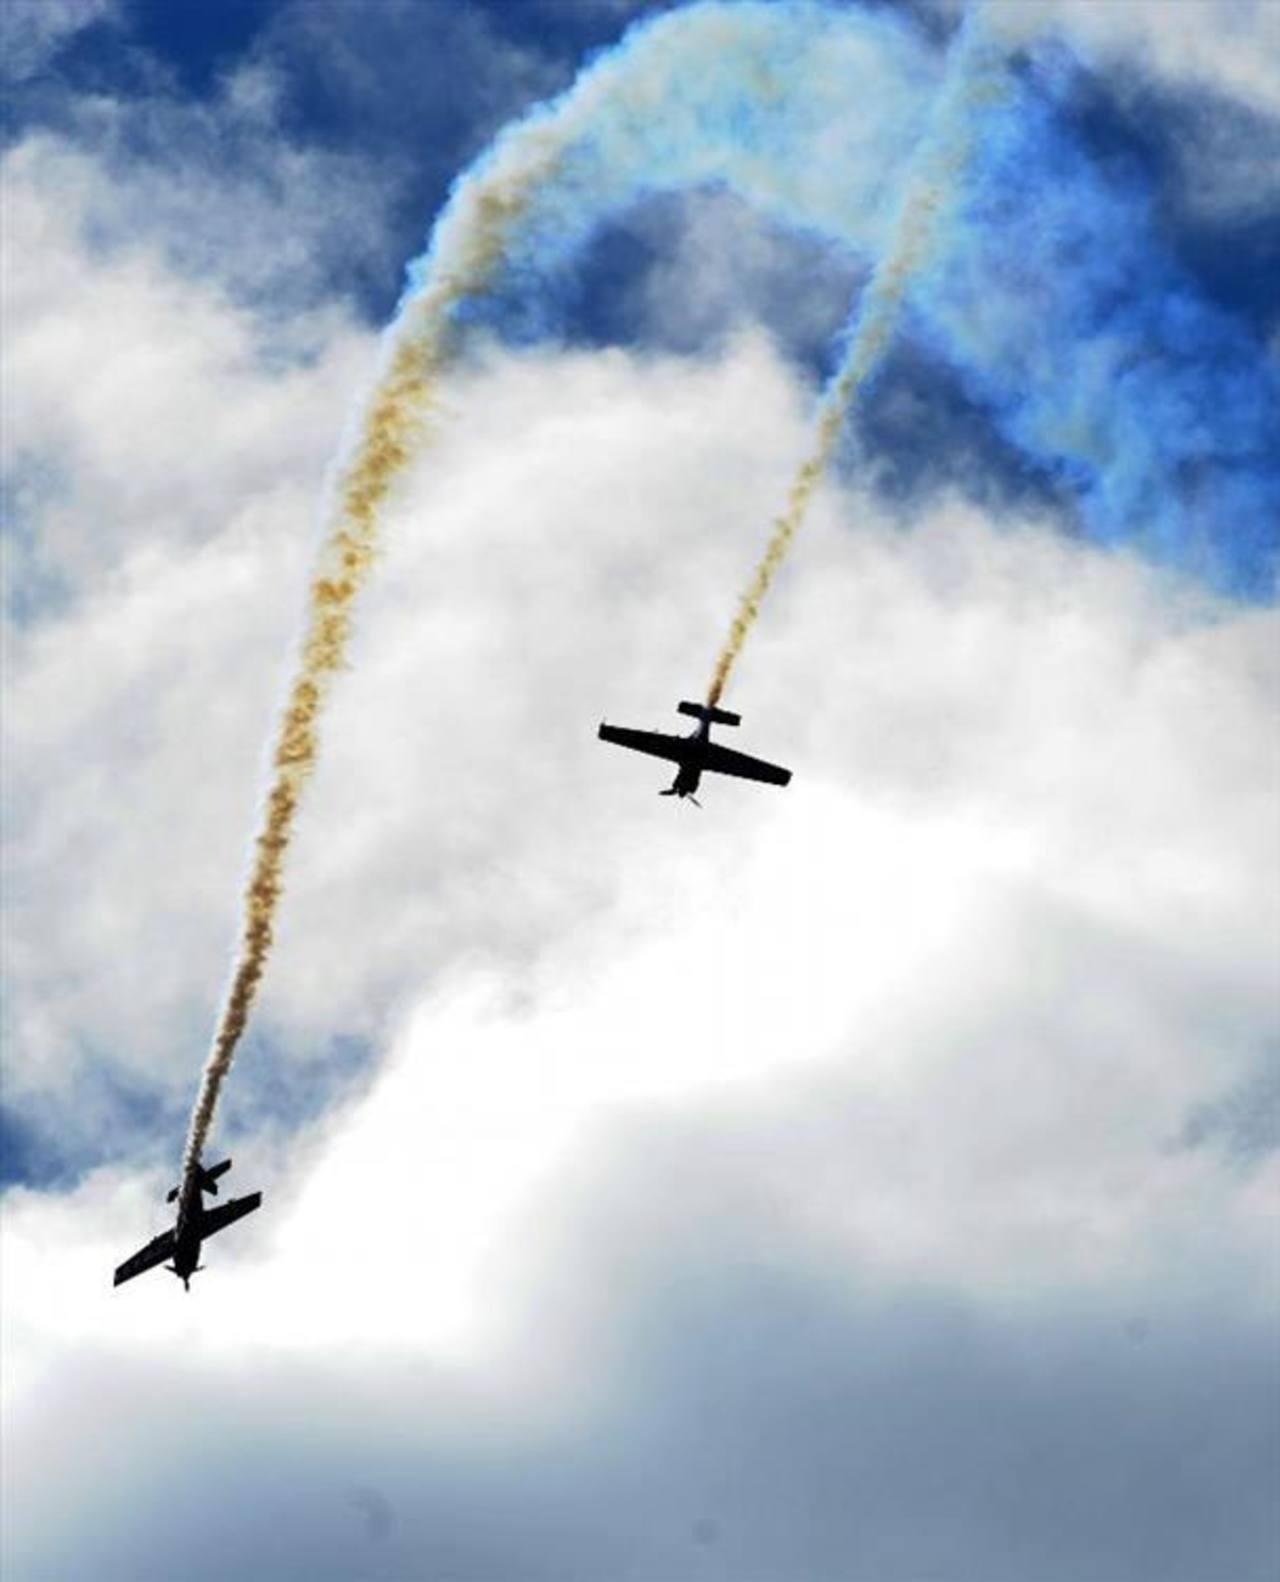 Cae avioneta militar durante acrobacia